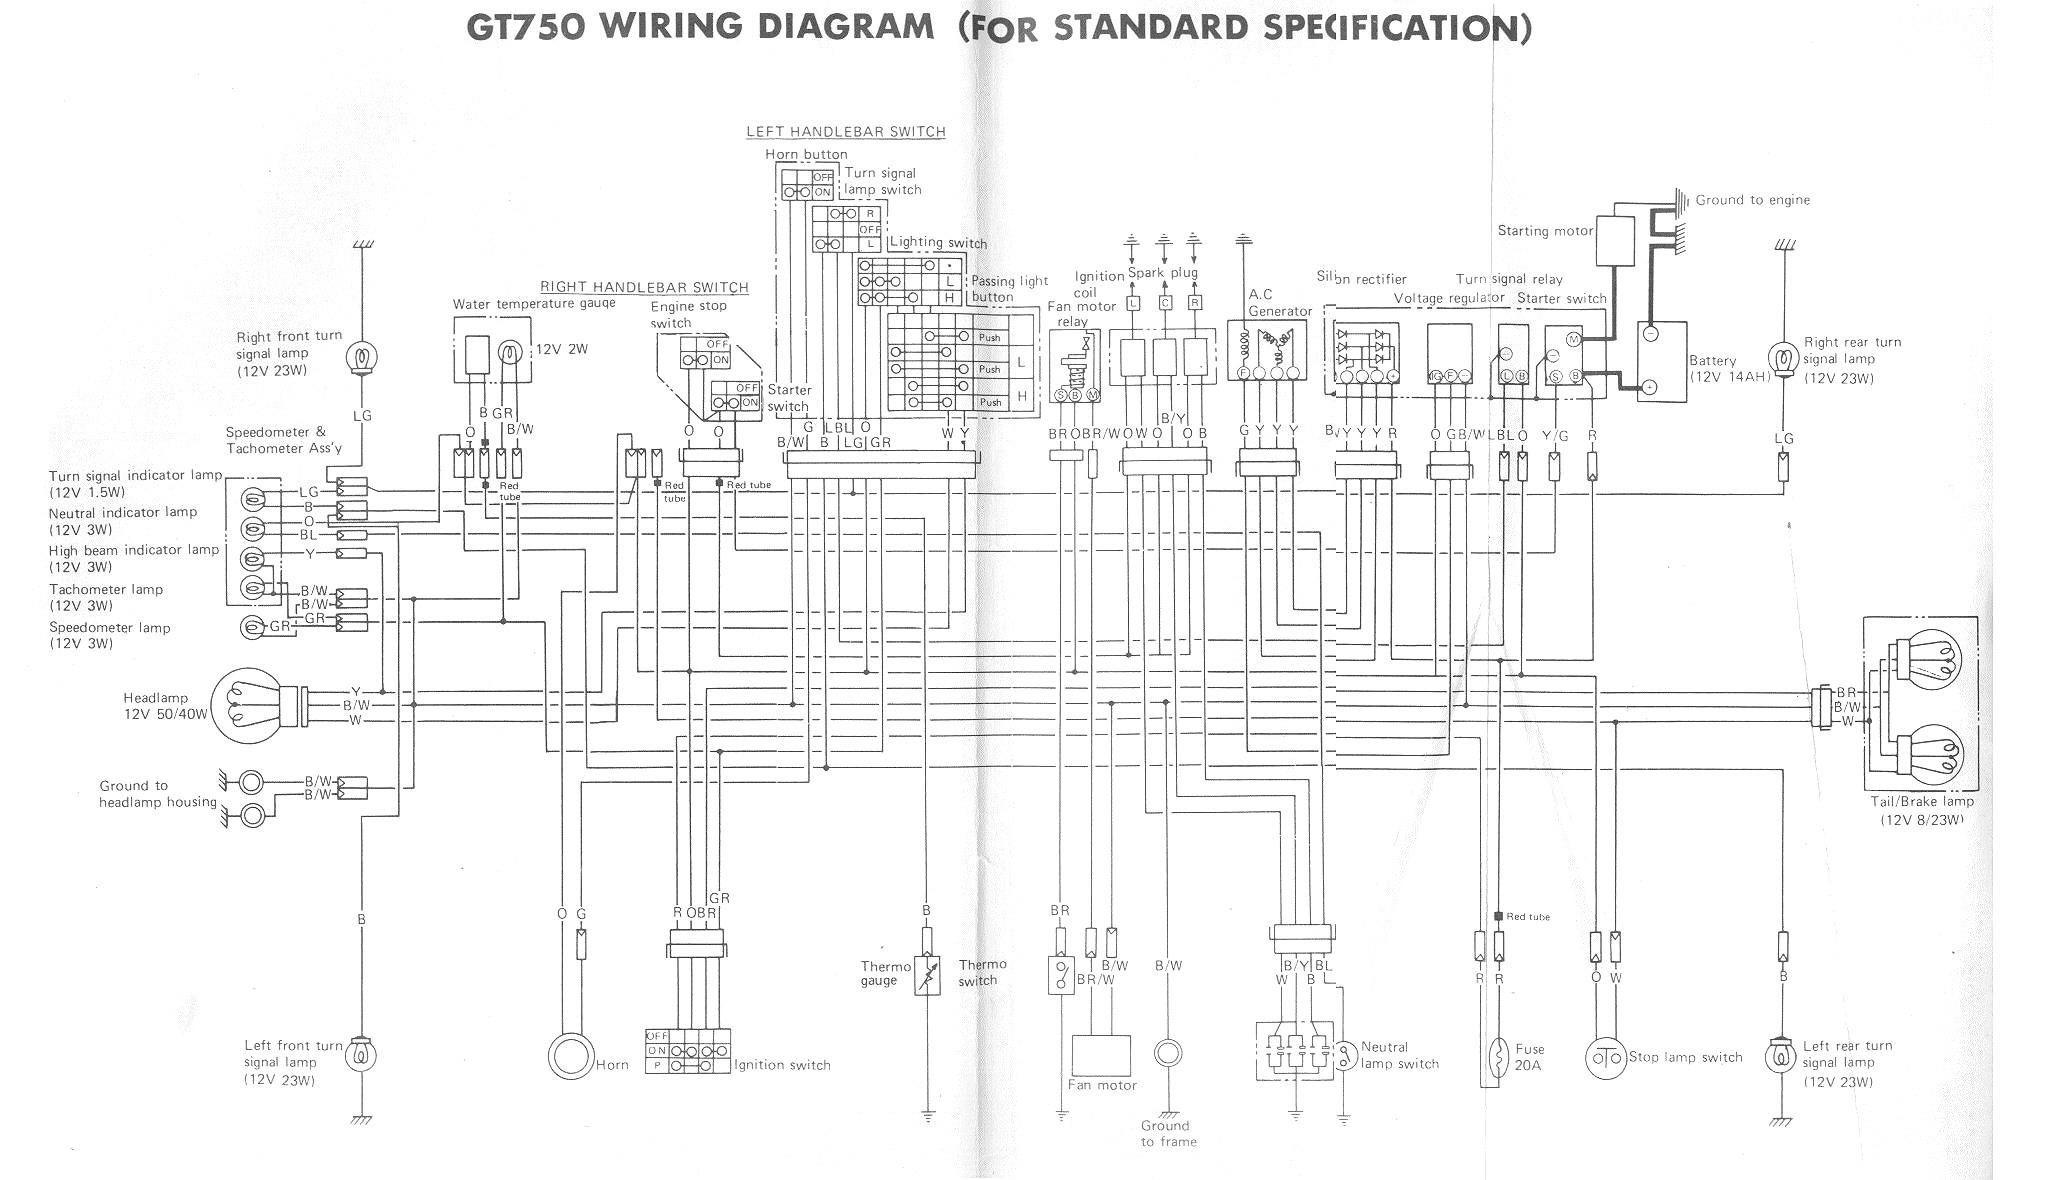 Gt750 Wireing 369kb